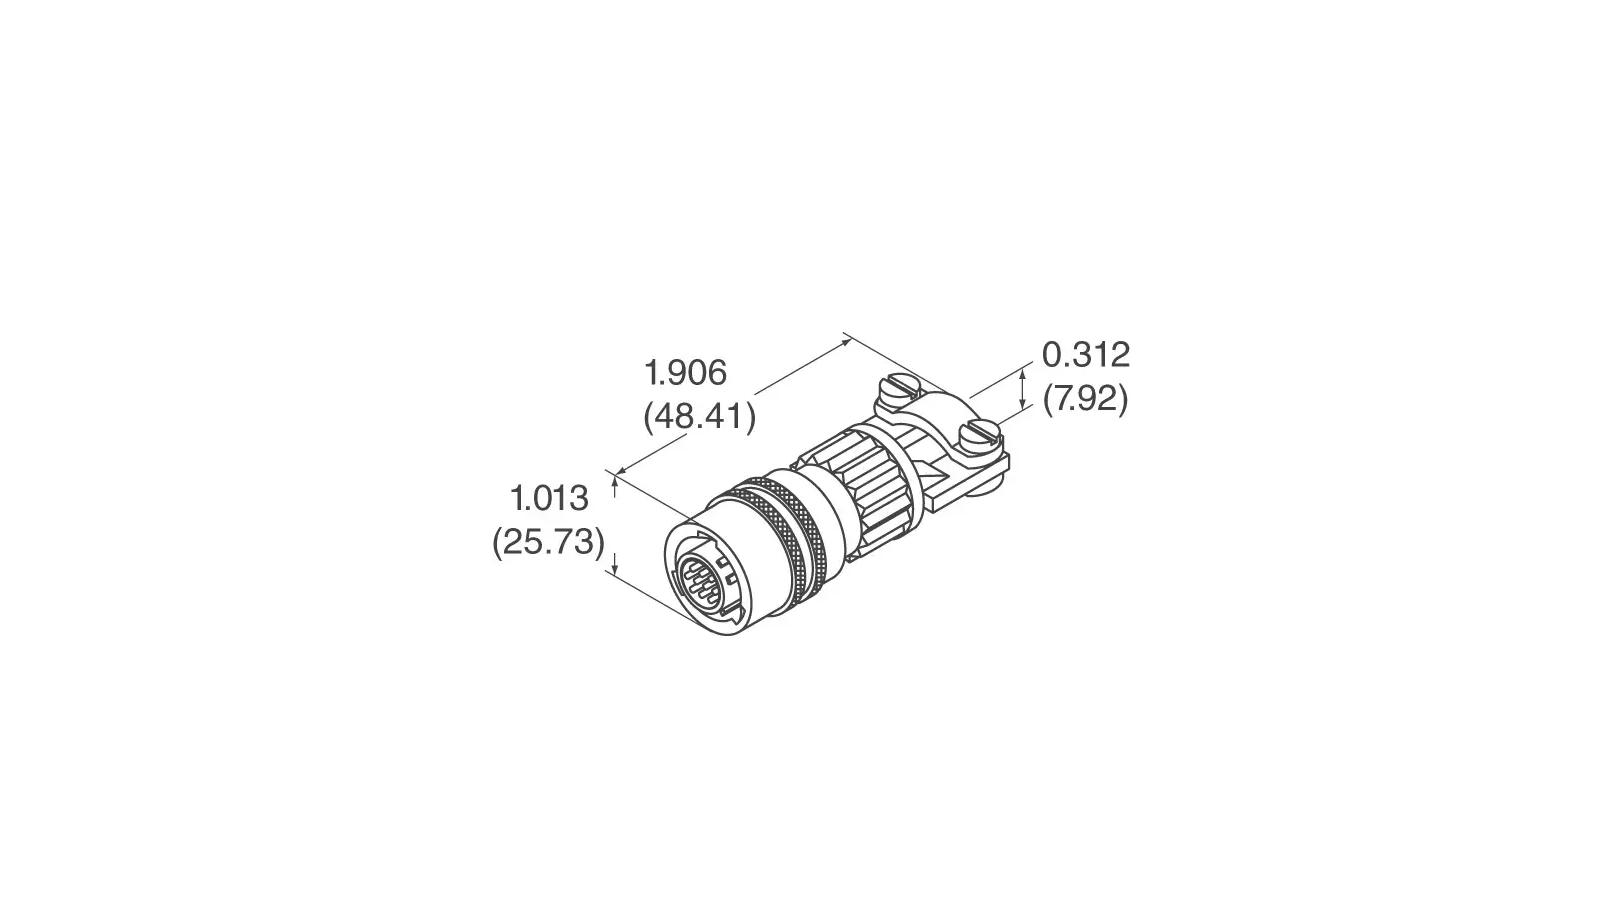 Sensor Connector for Raspberry JAM - Dimensions